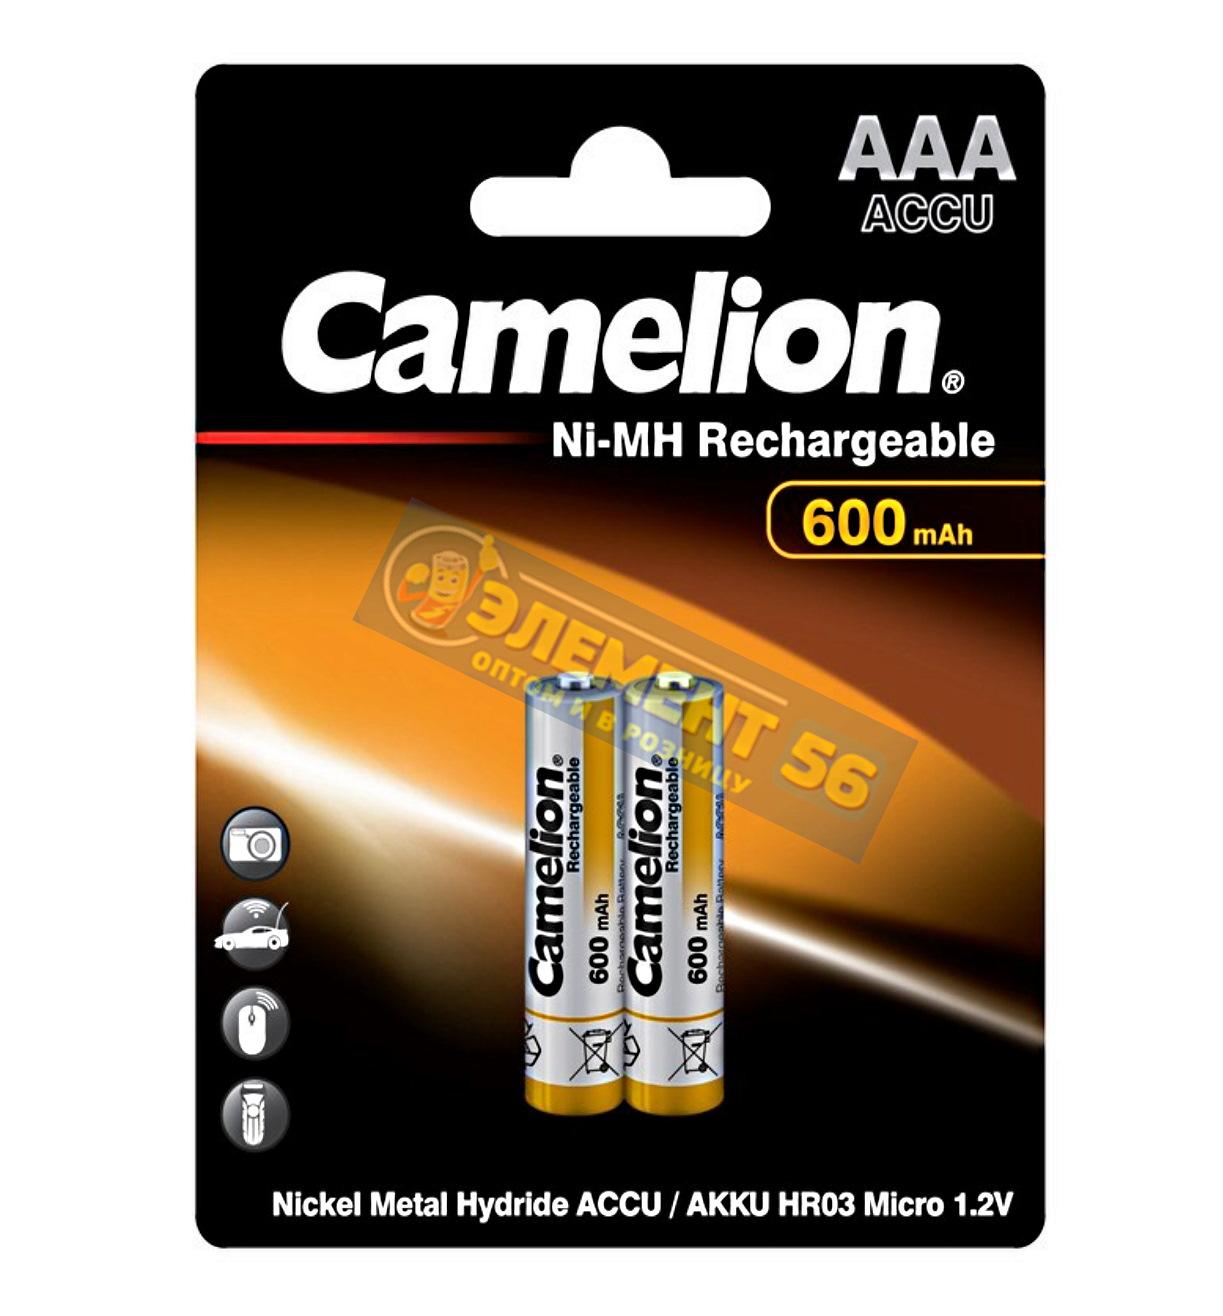 Аккумулятор CAMELION AAA, HR03 (600 mAh) MN2400, А286, 24A, AM4, UM4, HP16 2BL (2) (24) (480)